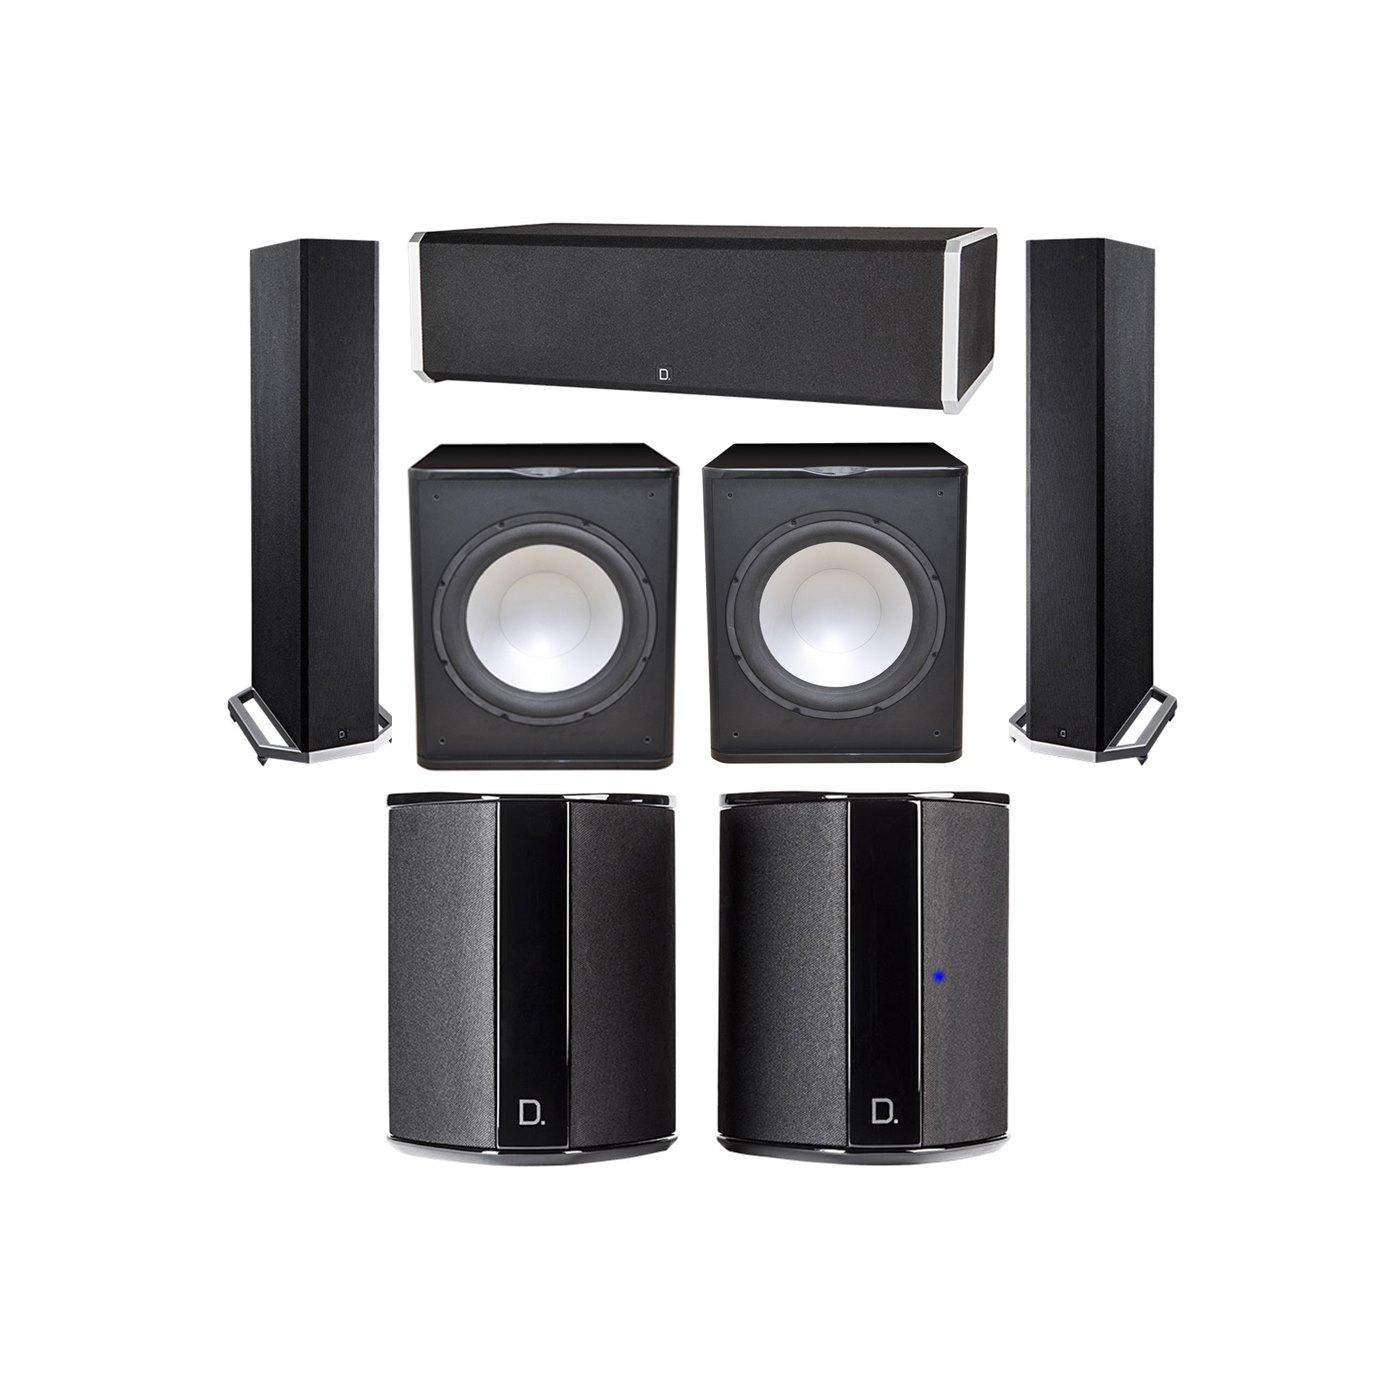 Definitive Technology 5.2 System with 2 BP9020 Tower Speakers, 1 CS9060 Center Channel Speaker, 2 SR9040 Surround Speaker, 2 Premier Acoustic PA-150 Subwoofer